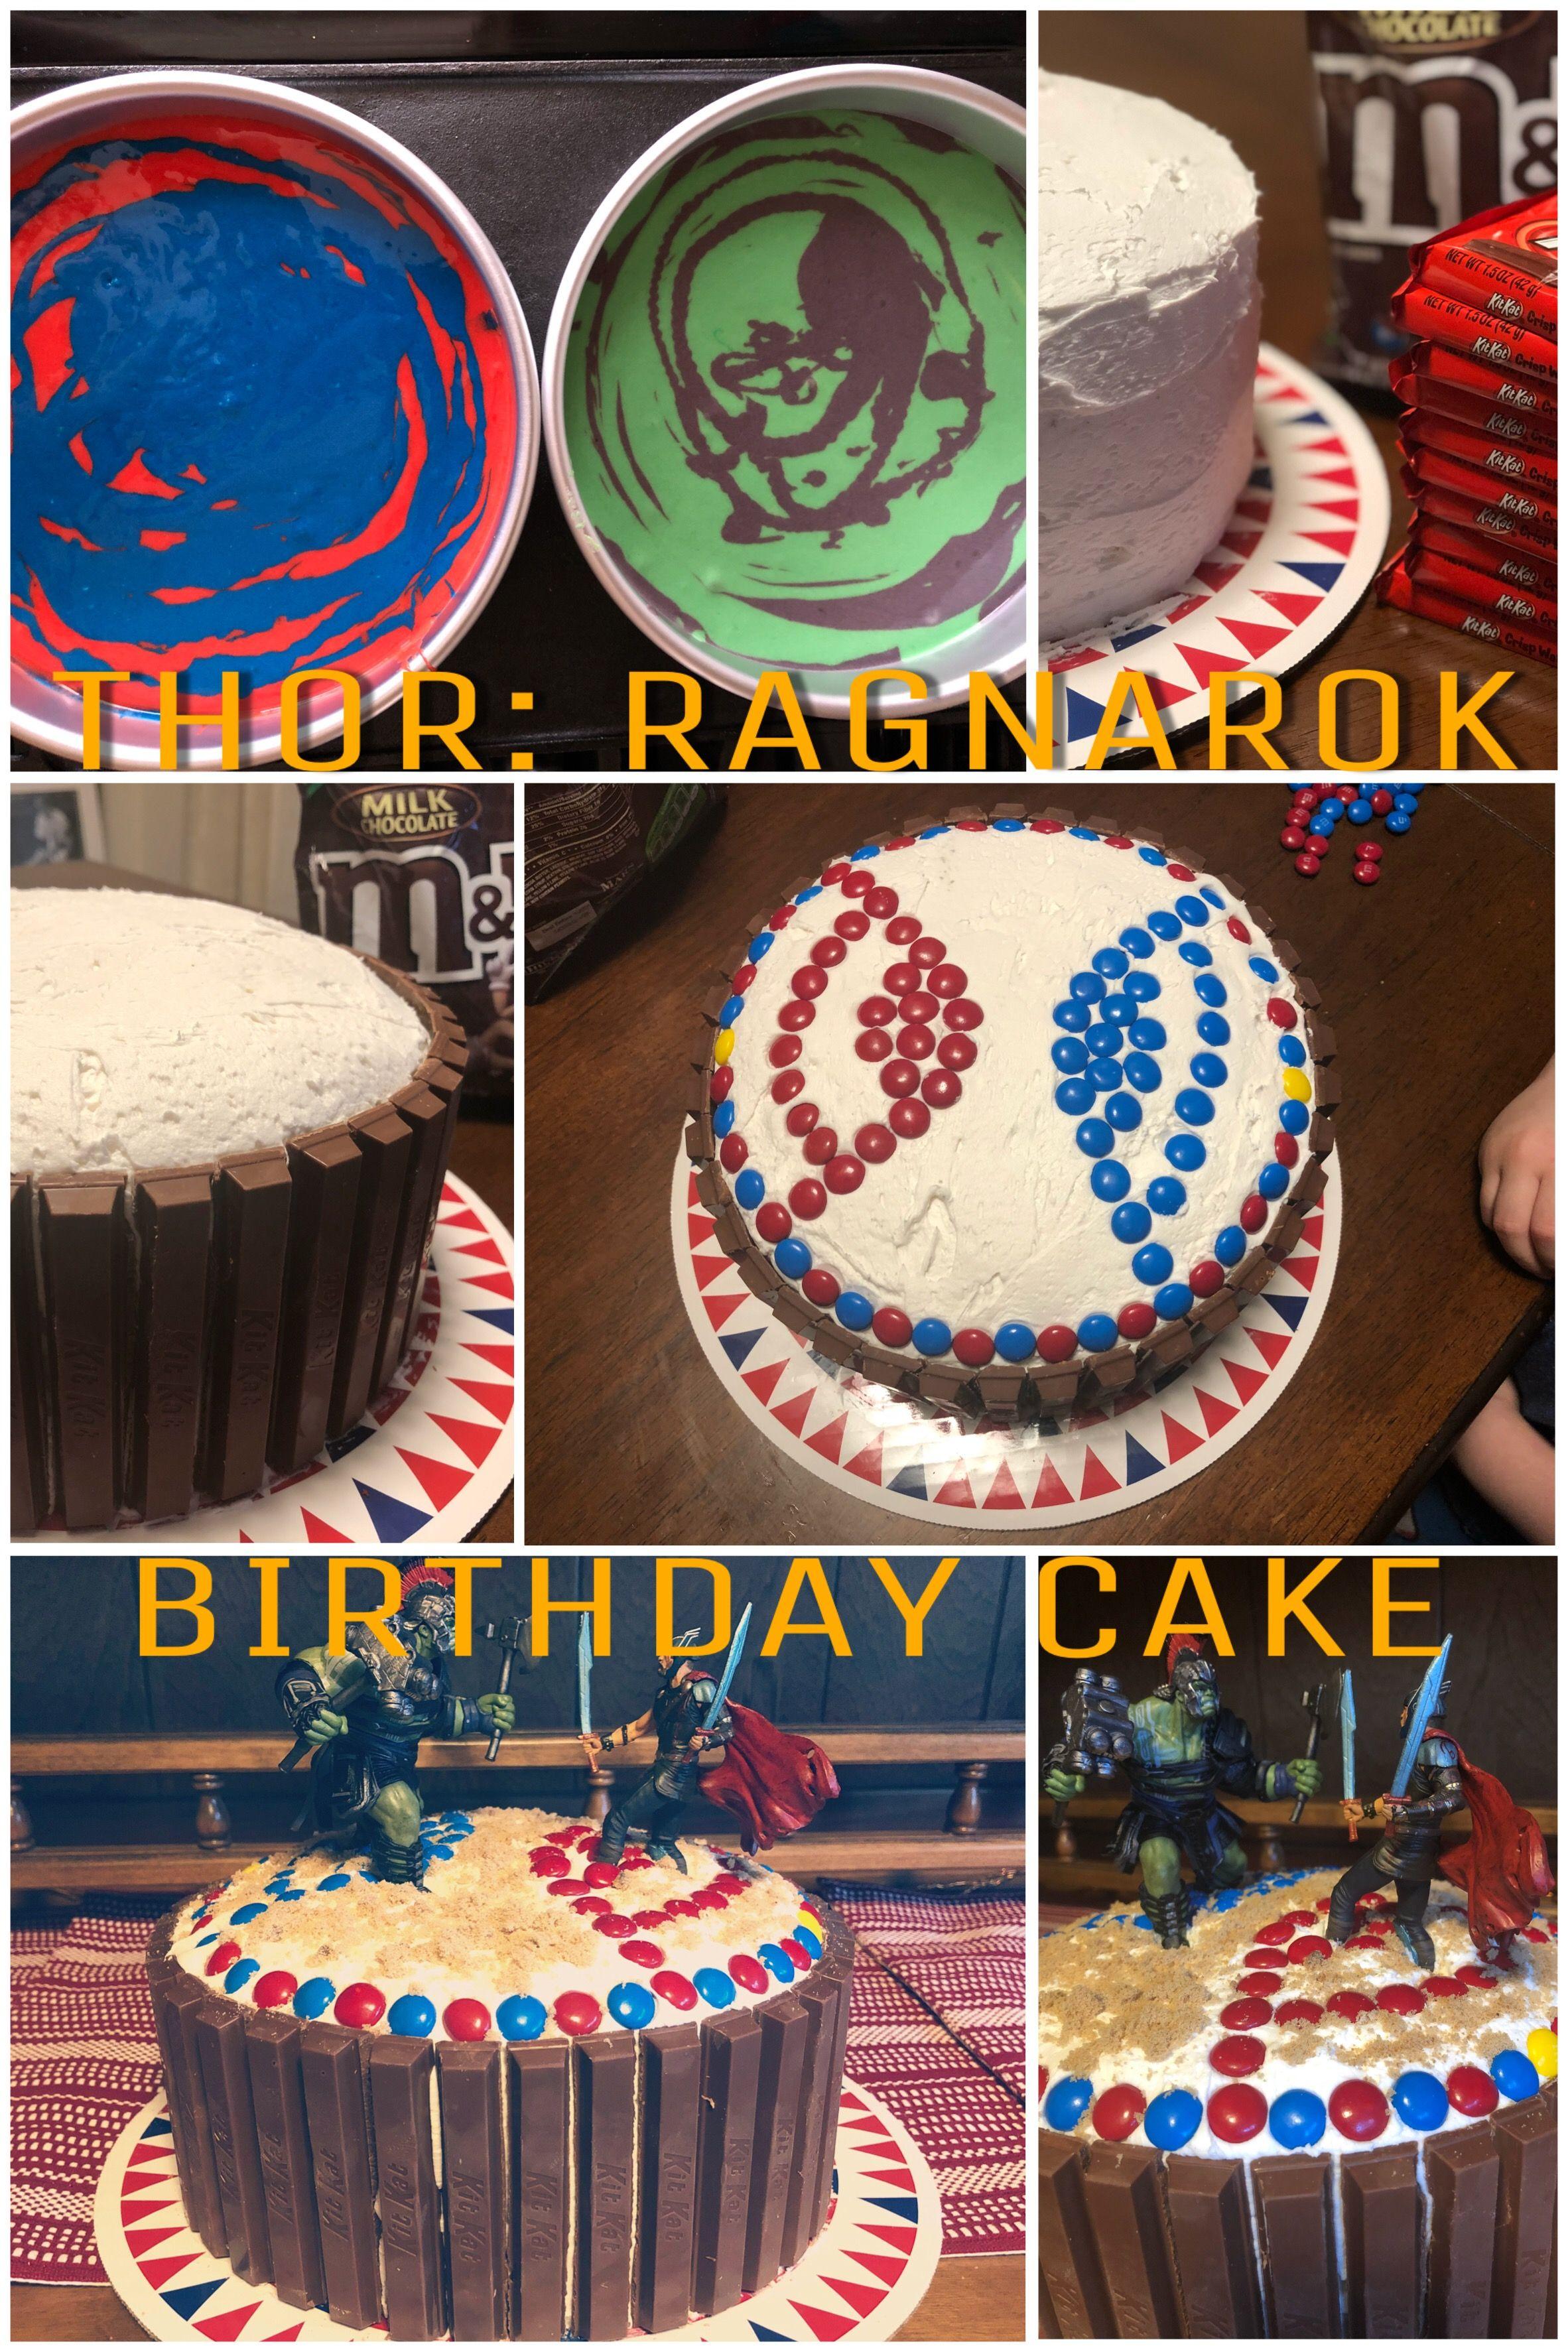 Thor Ragnarok Birthday Cake Duff Cake Mix I Found At My Local